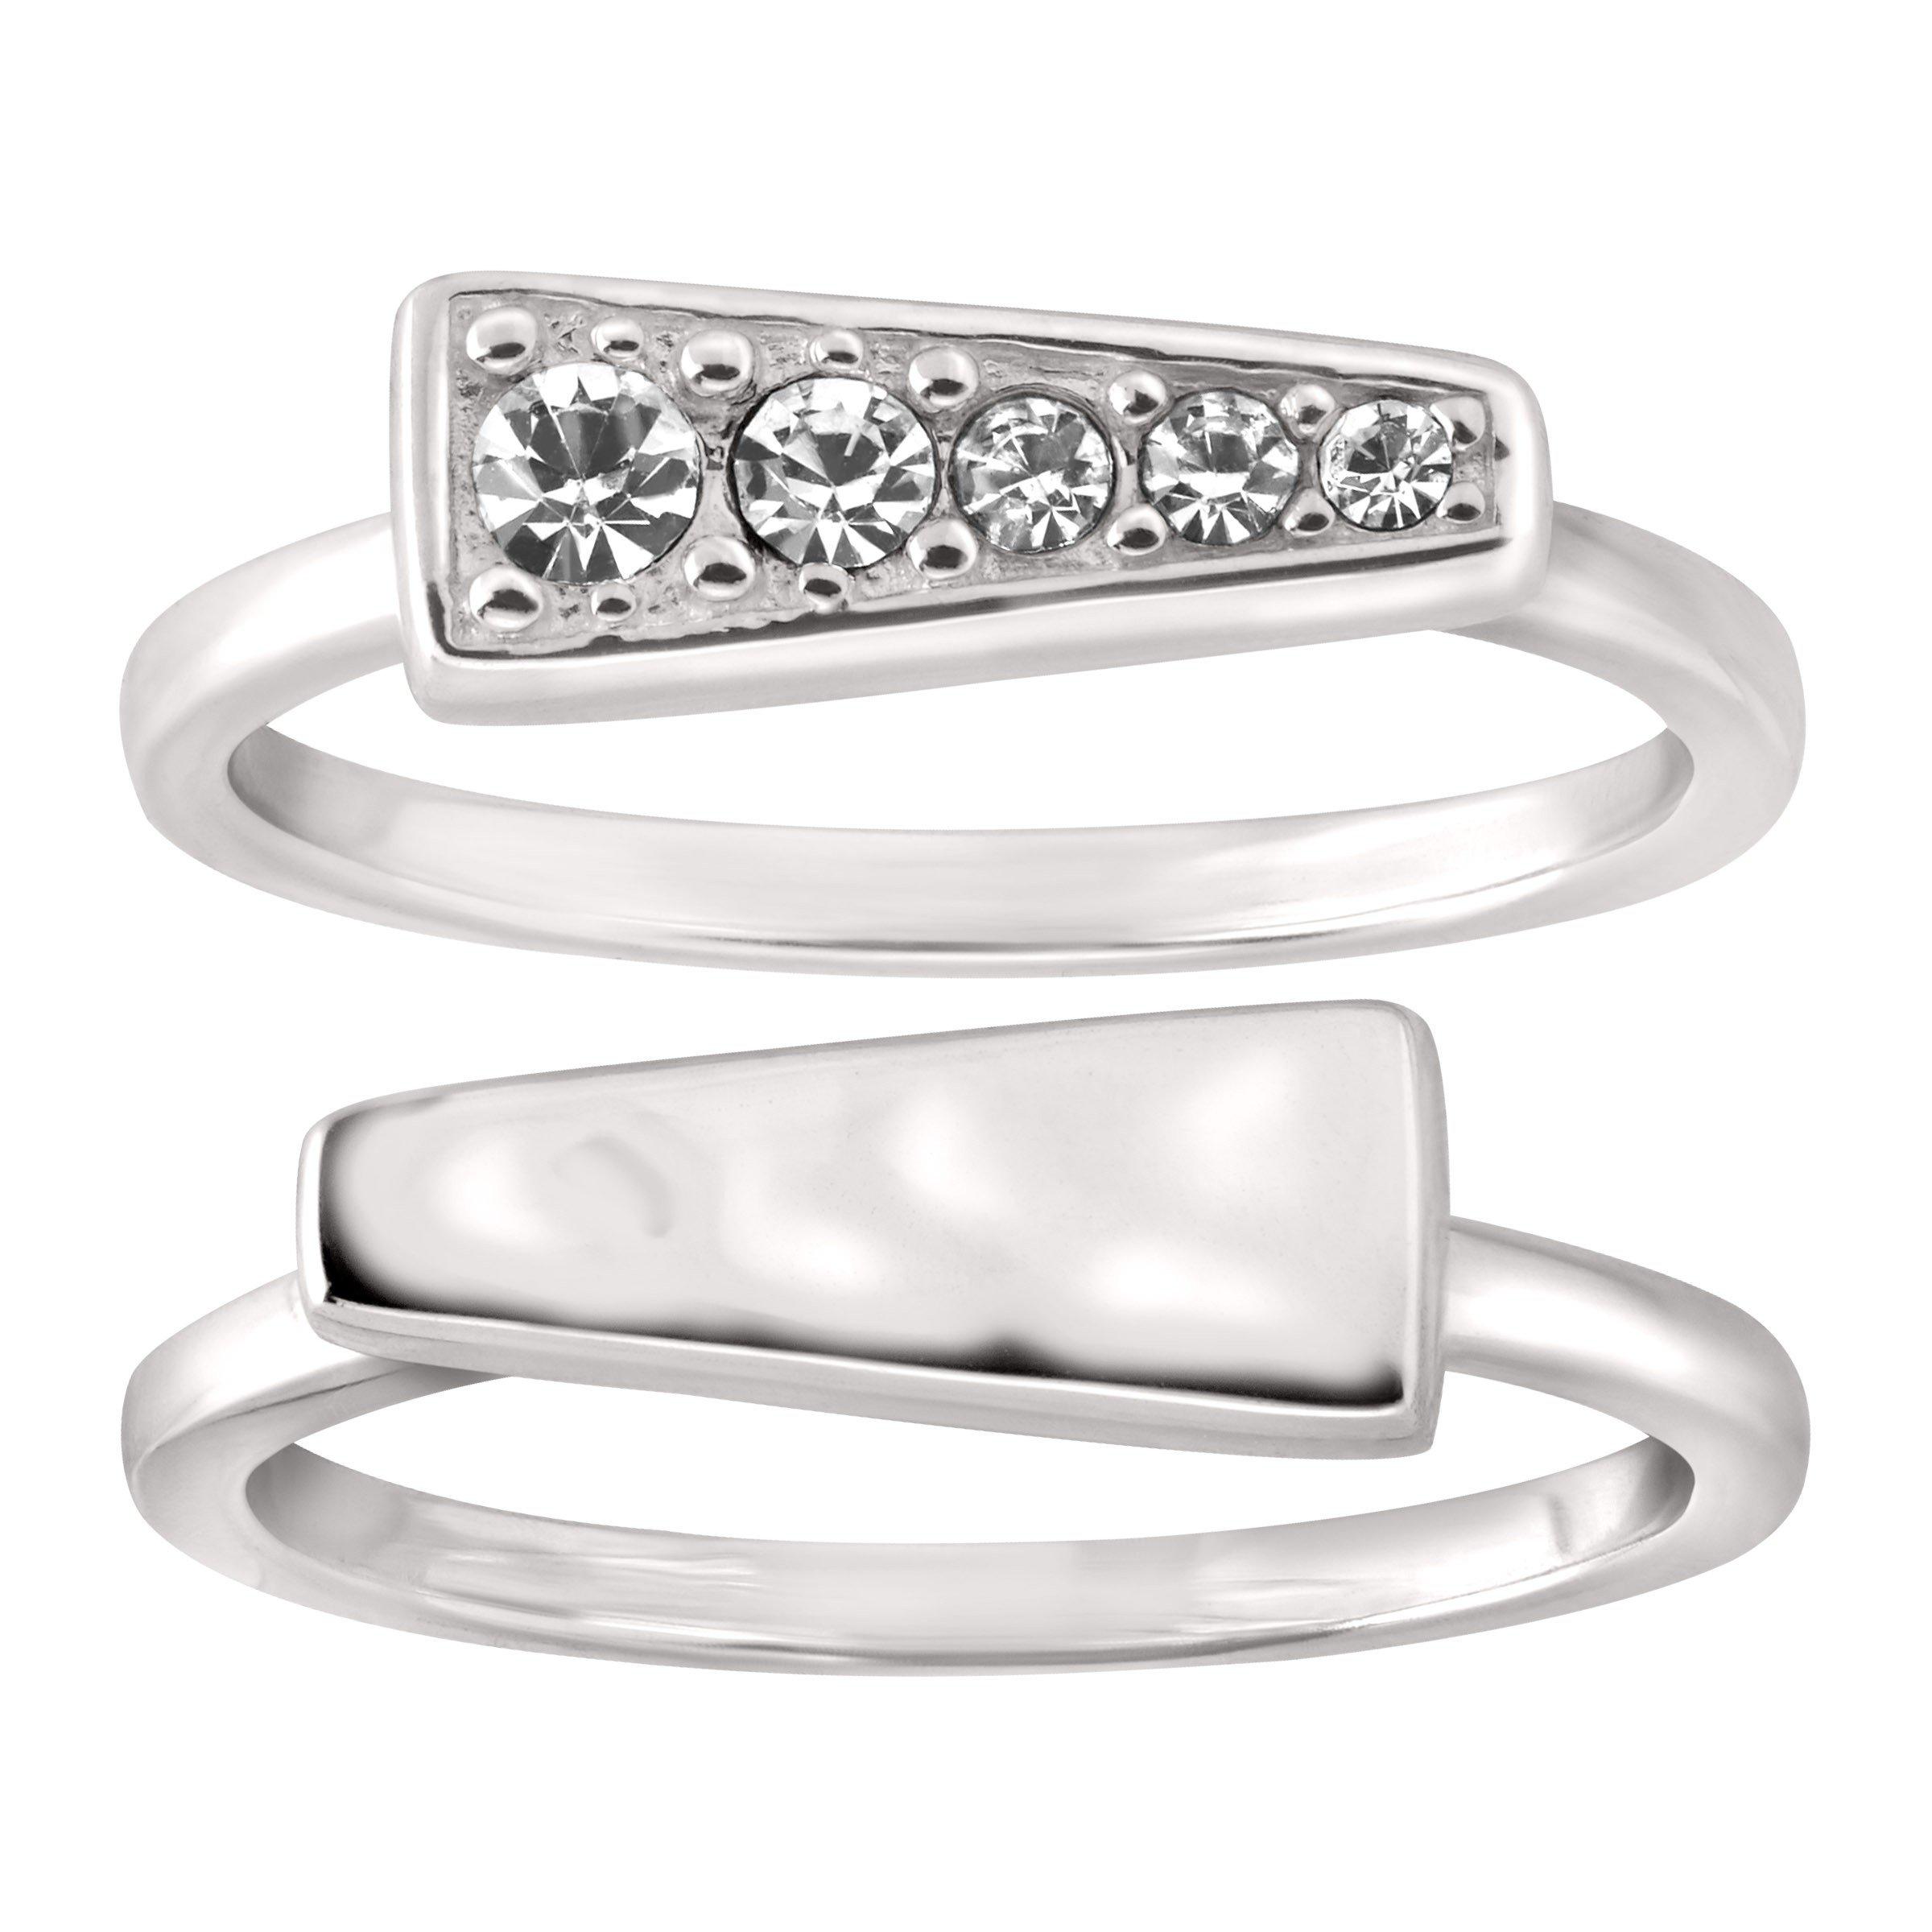 Silpada 'Spotlight Stack' Sterling Silver Rings, Size 8